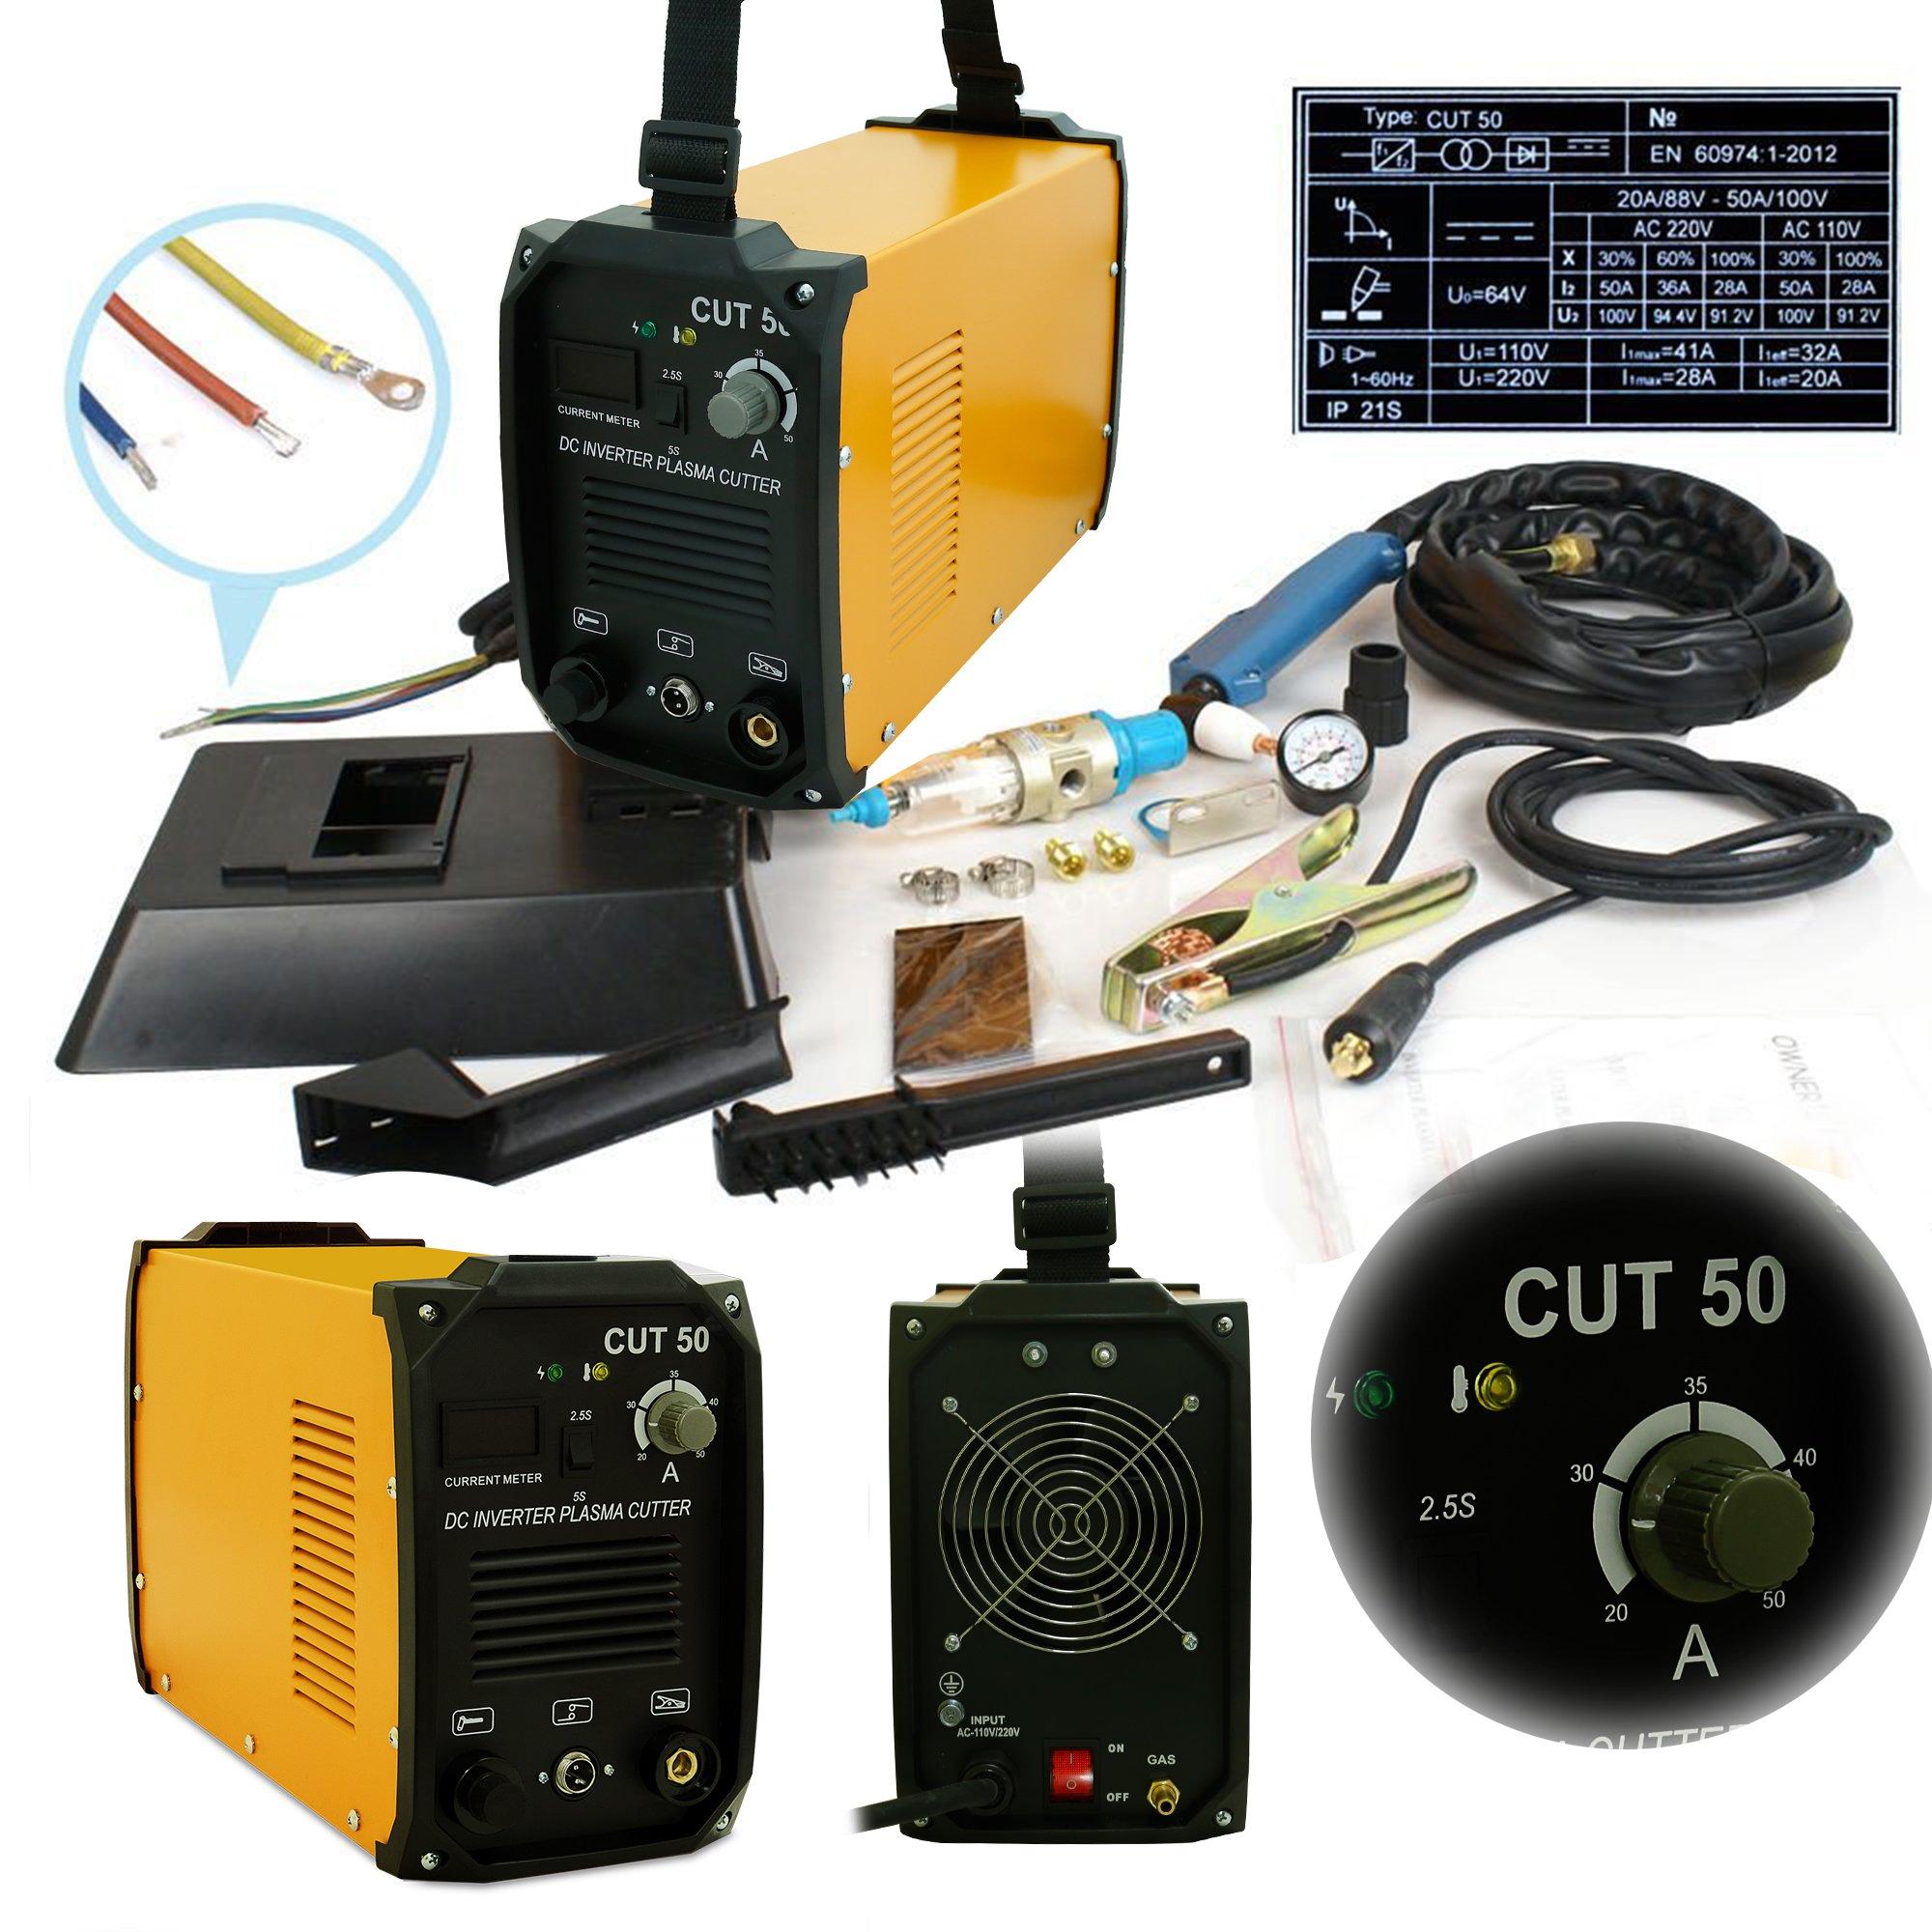 VIVOHOME DC Inverter Plasma Cutter Cutting Machine Dual Voltage 110V/220V CUT-50 by VIVOHOME (Image #2)